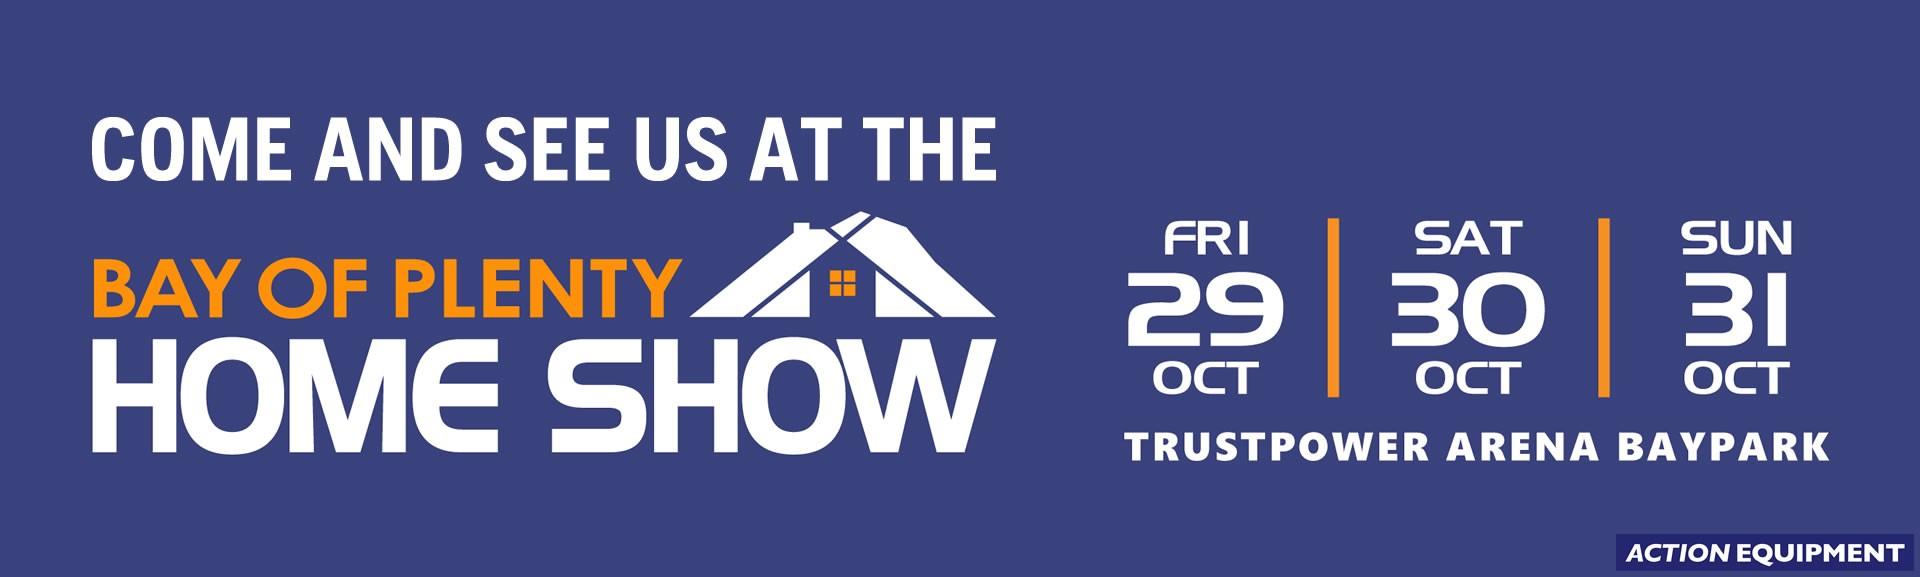 Bay of Plenty Home Show - October 2021